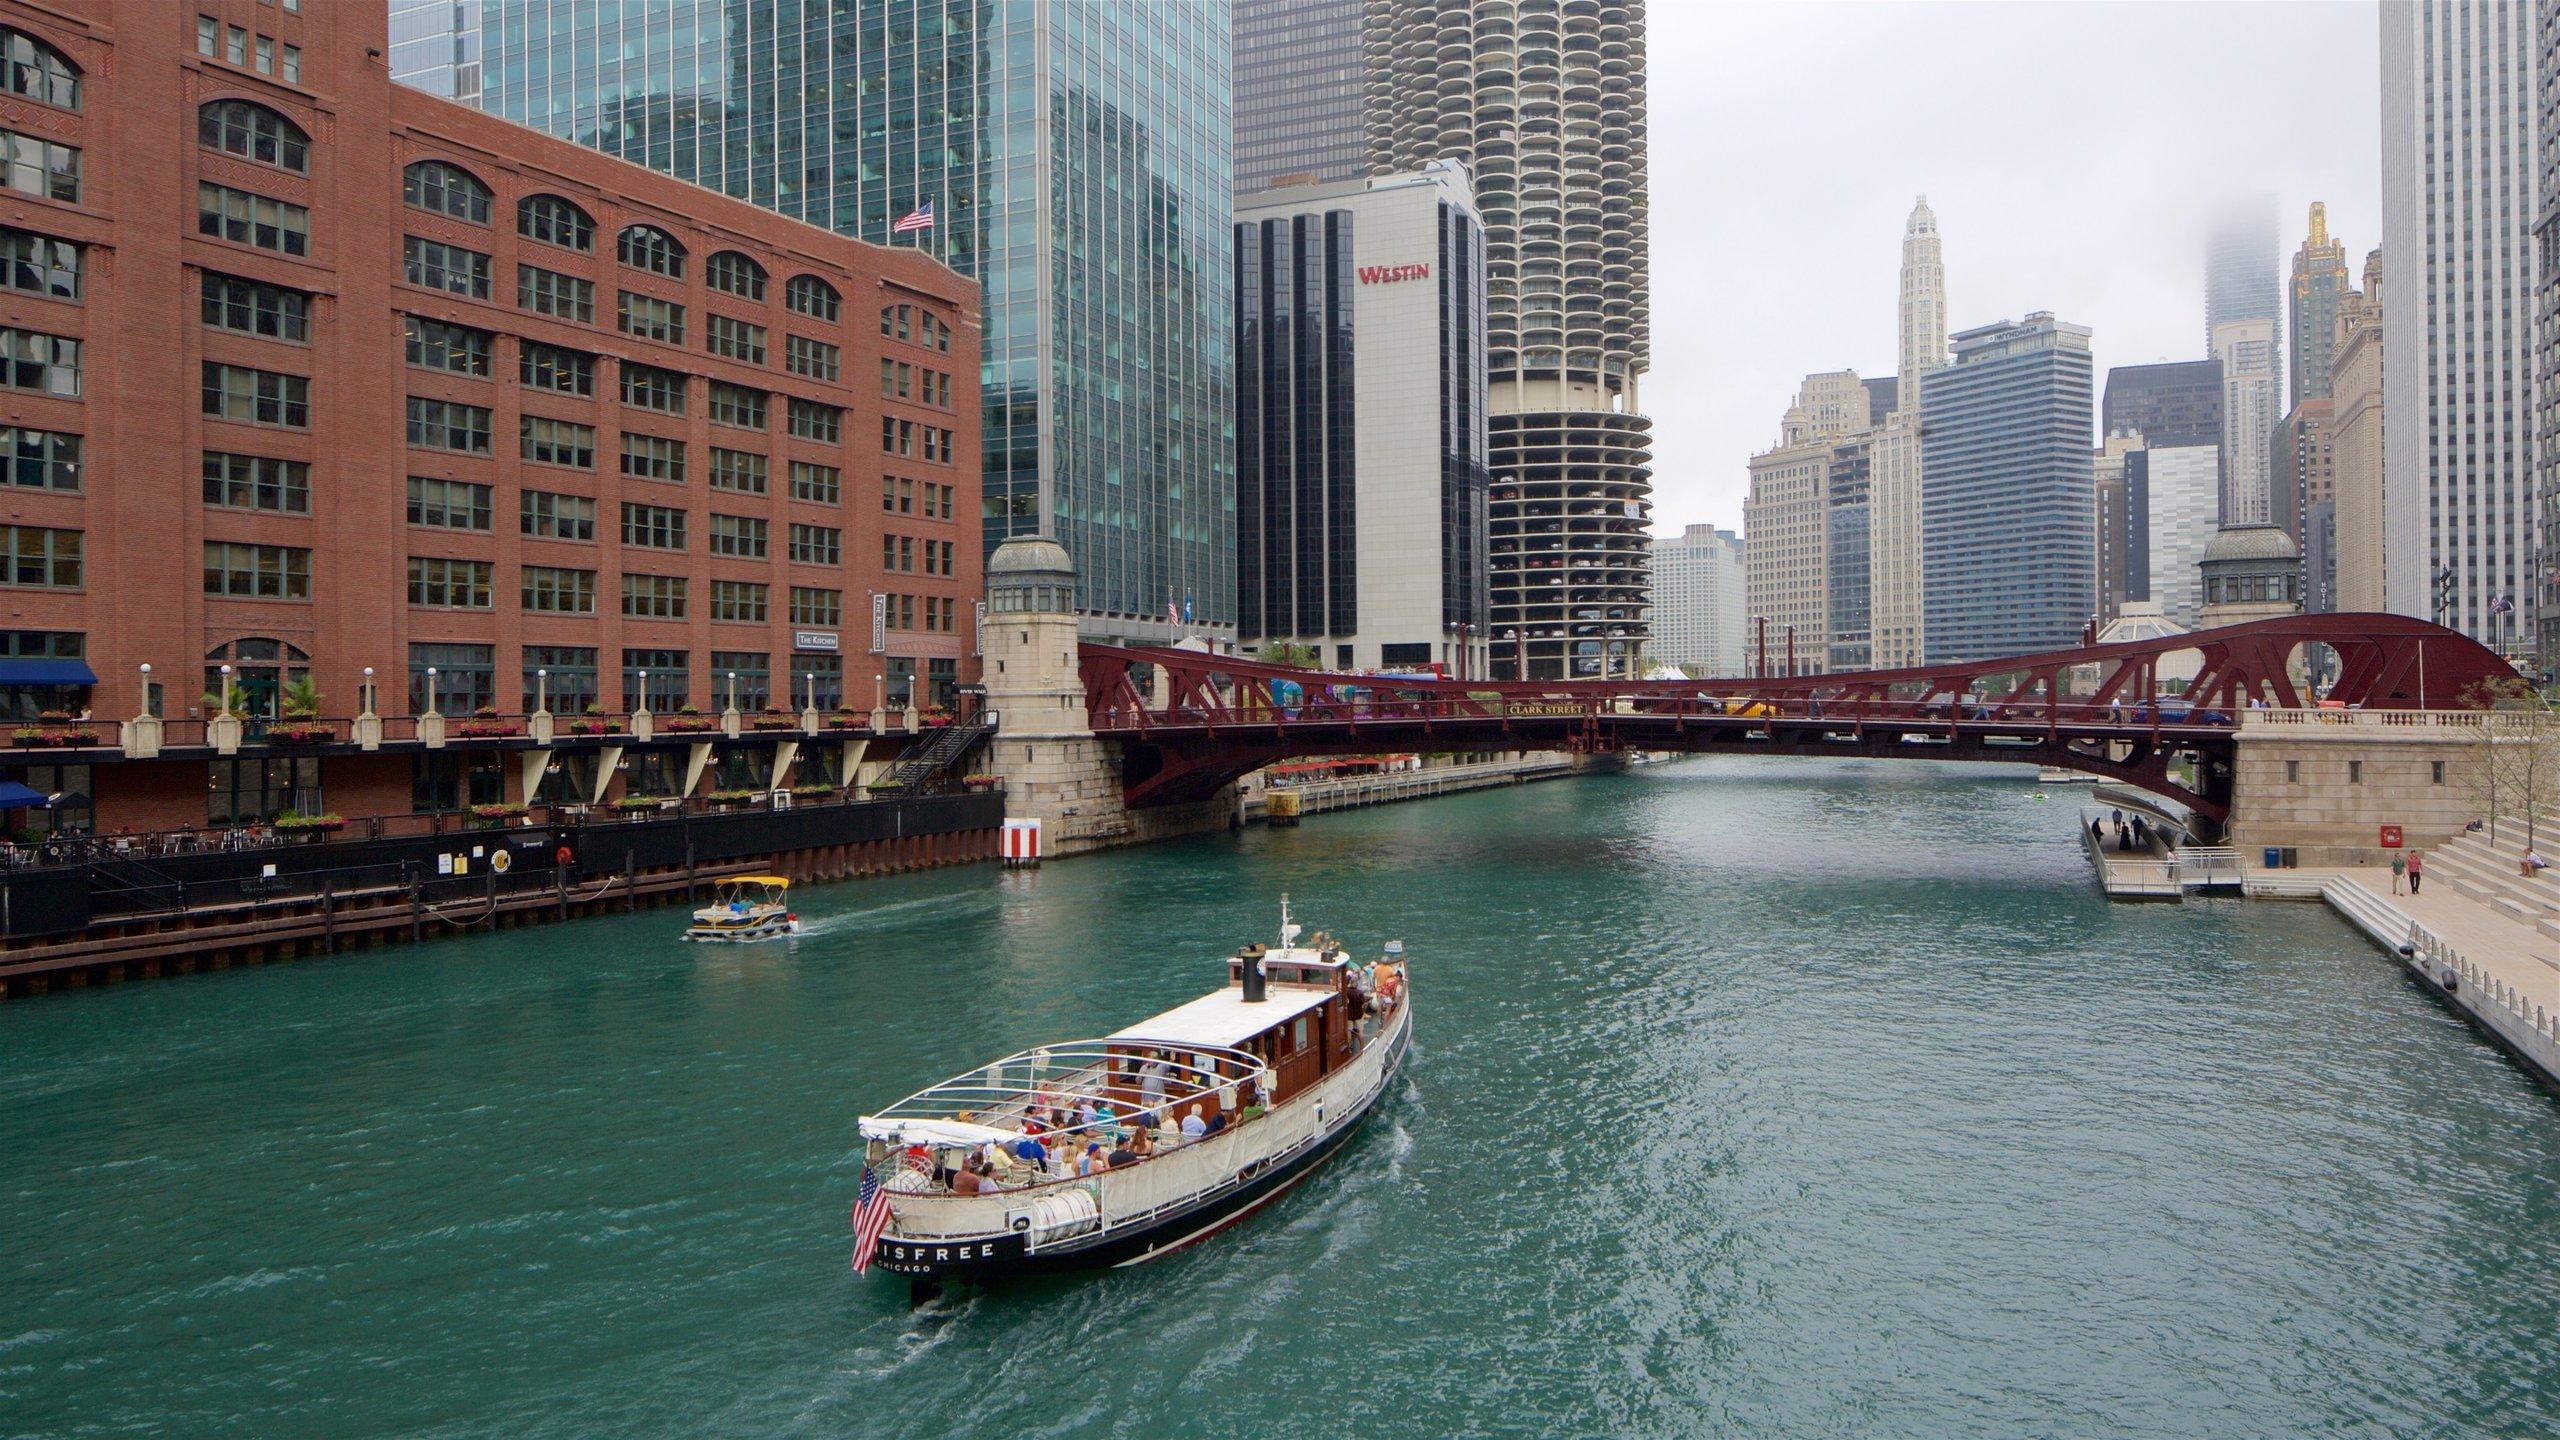 Bridgehouse and Chicago River Museum, Chicago, Illinois, Verenigde Staten